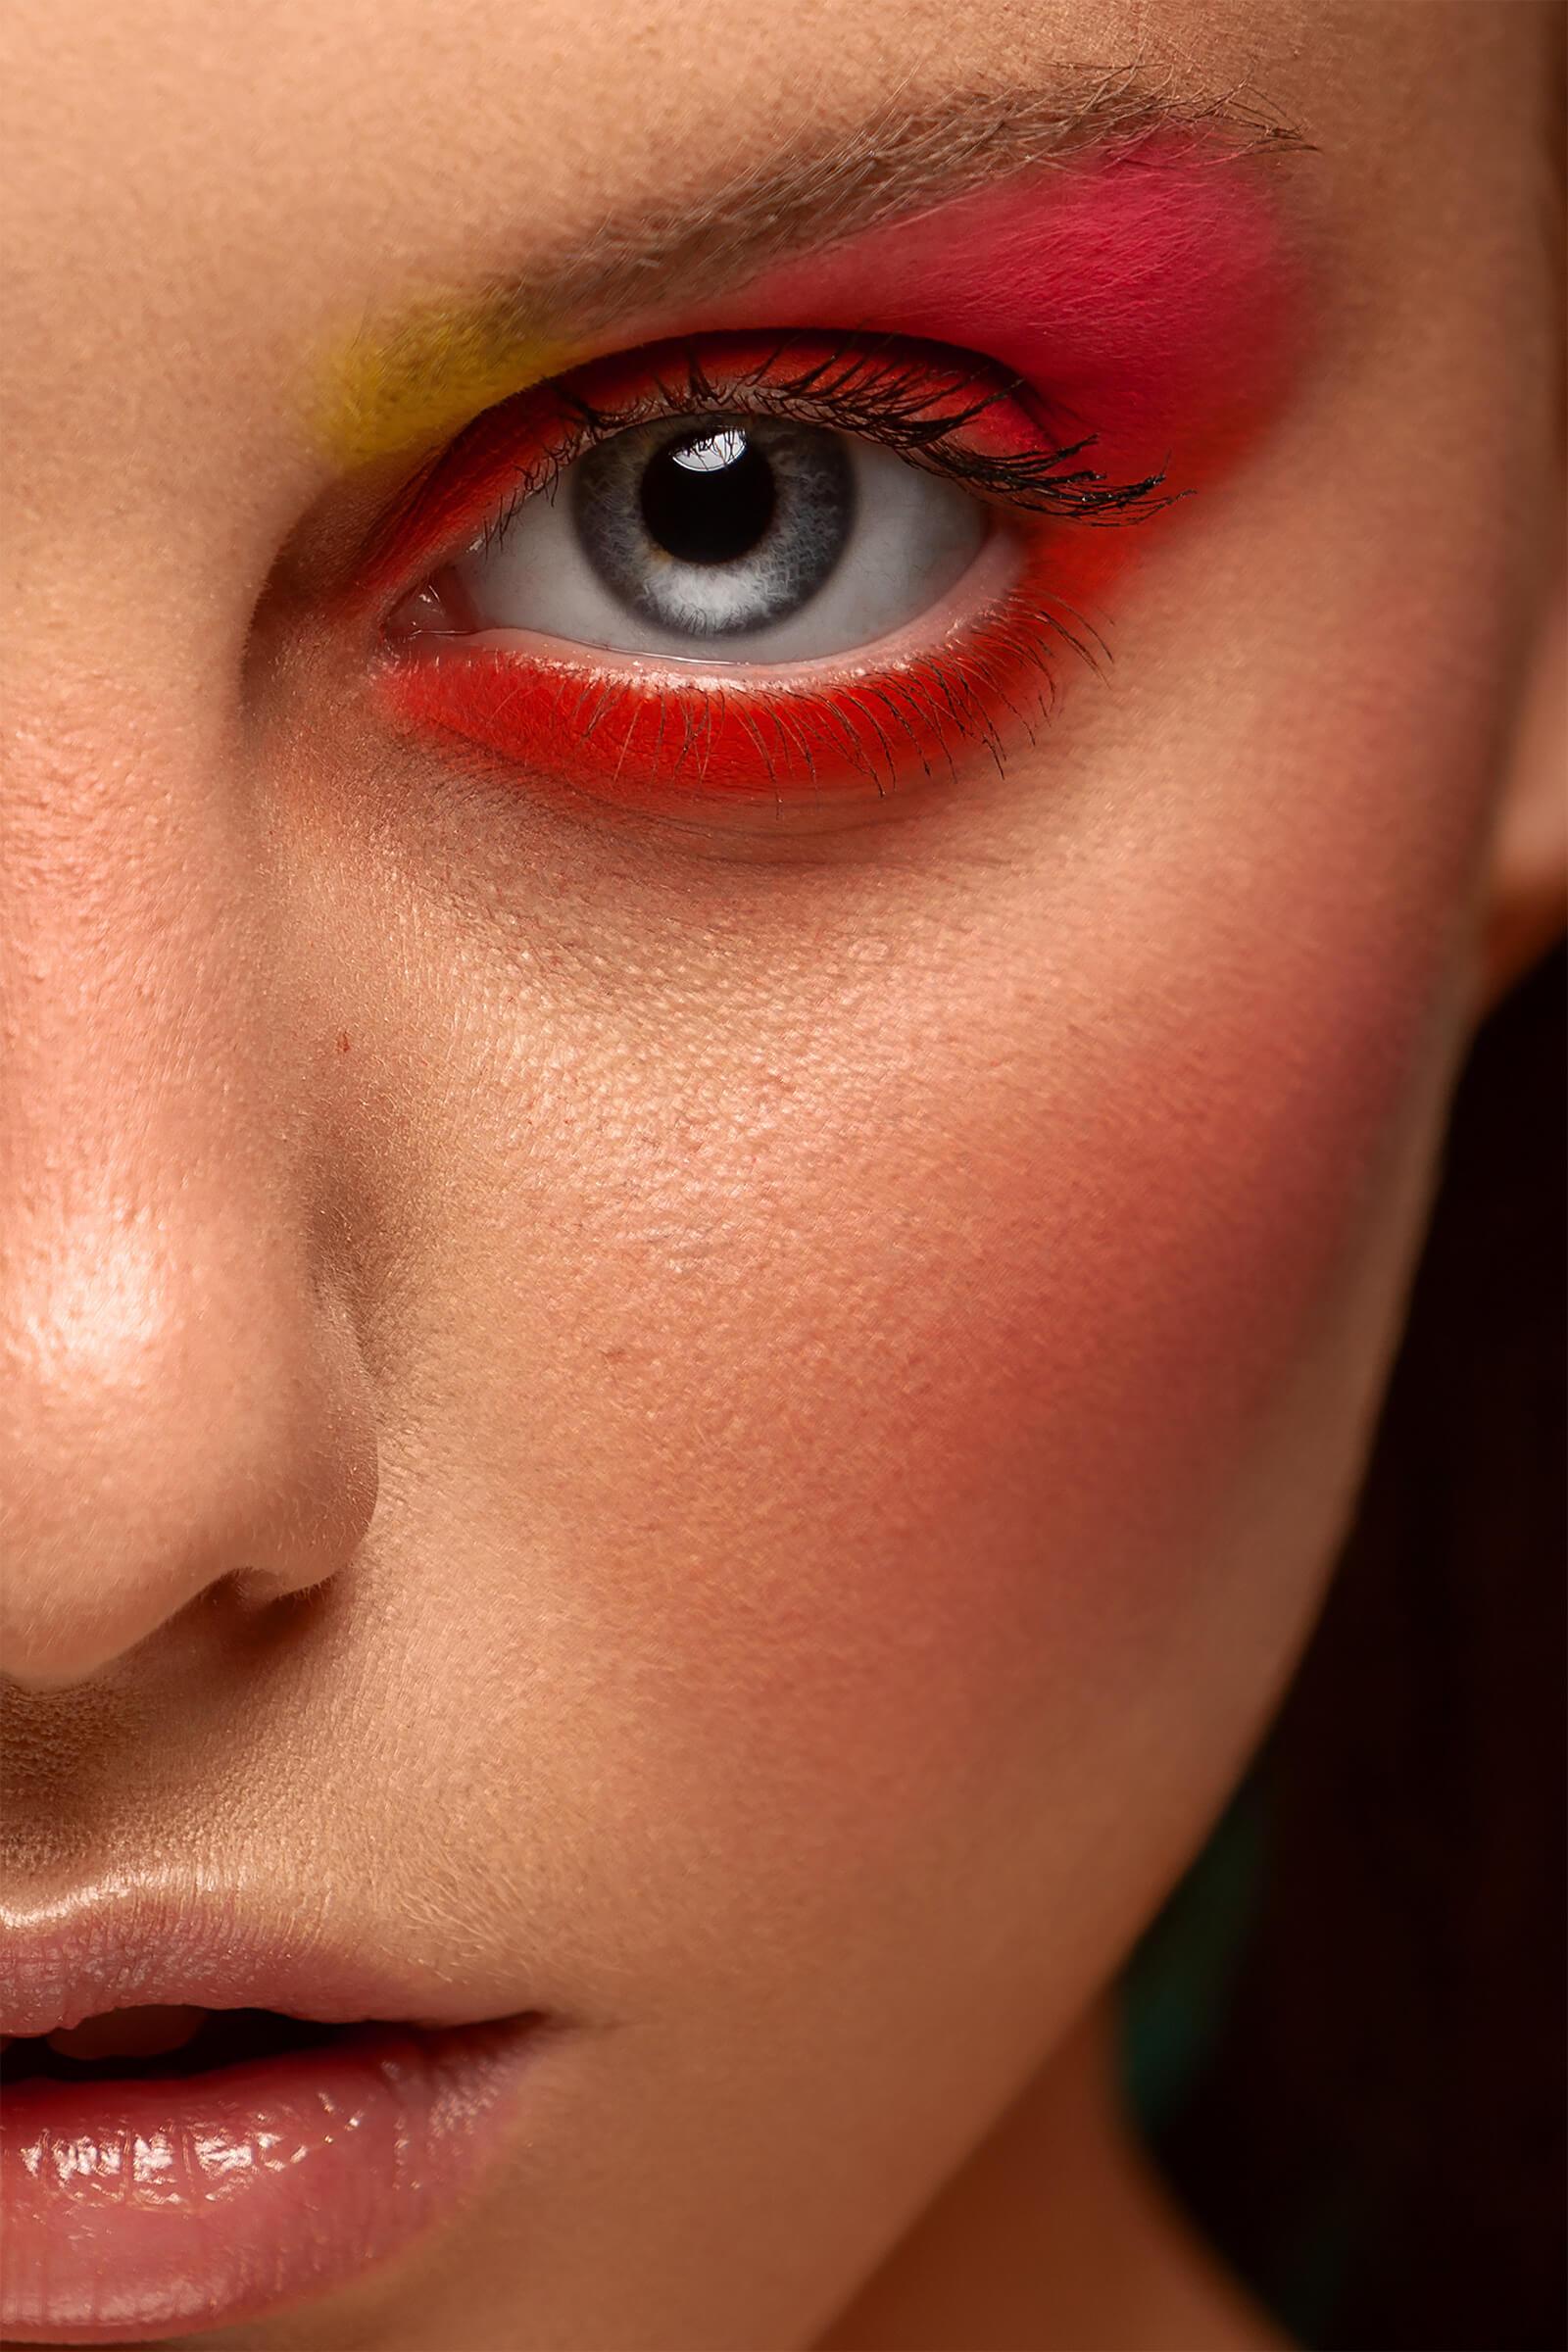 Anastasia Makeup Campaign Image Retouching